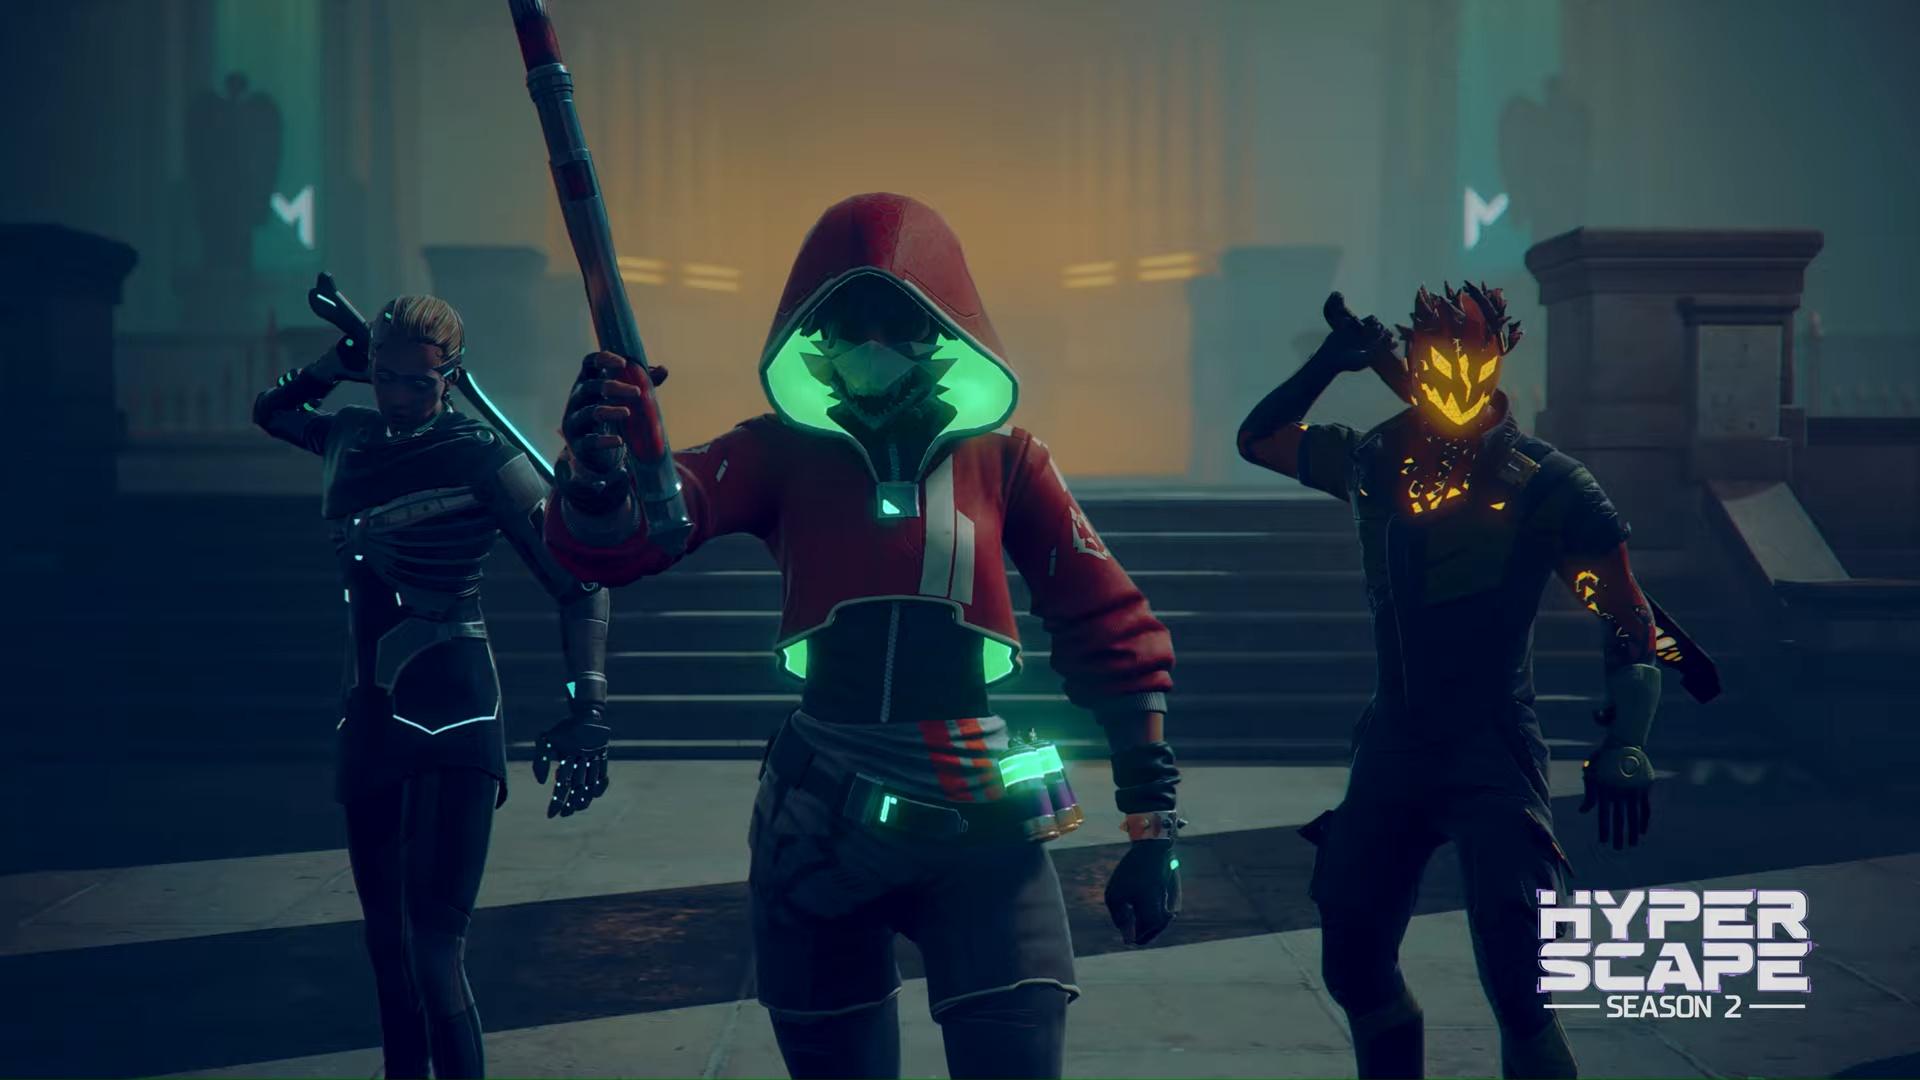 Hyper Scape's Halloween Event Kicks Off This Week - Xbox One, Xbox 360 News  At XboxAchievements.com